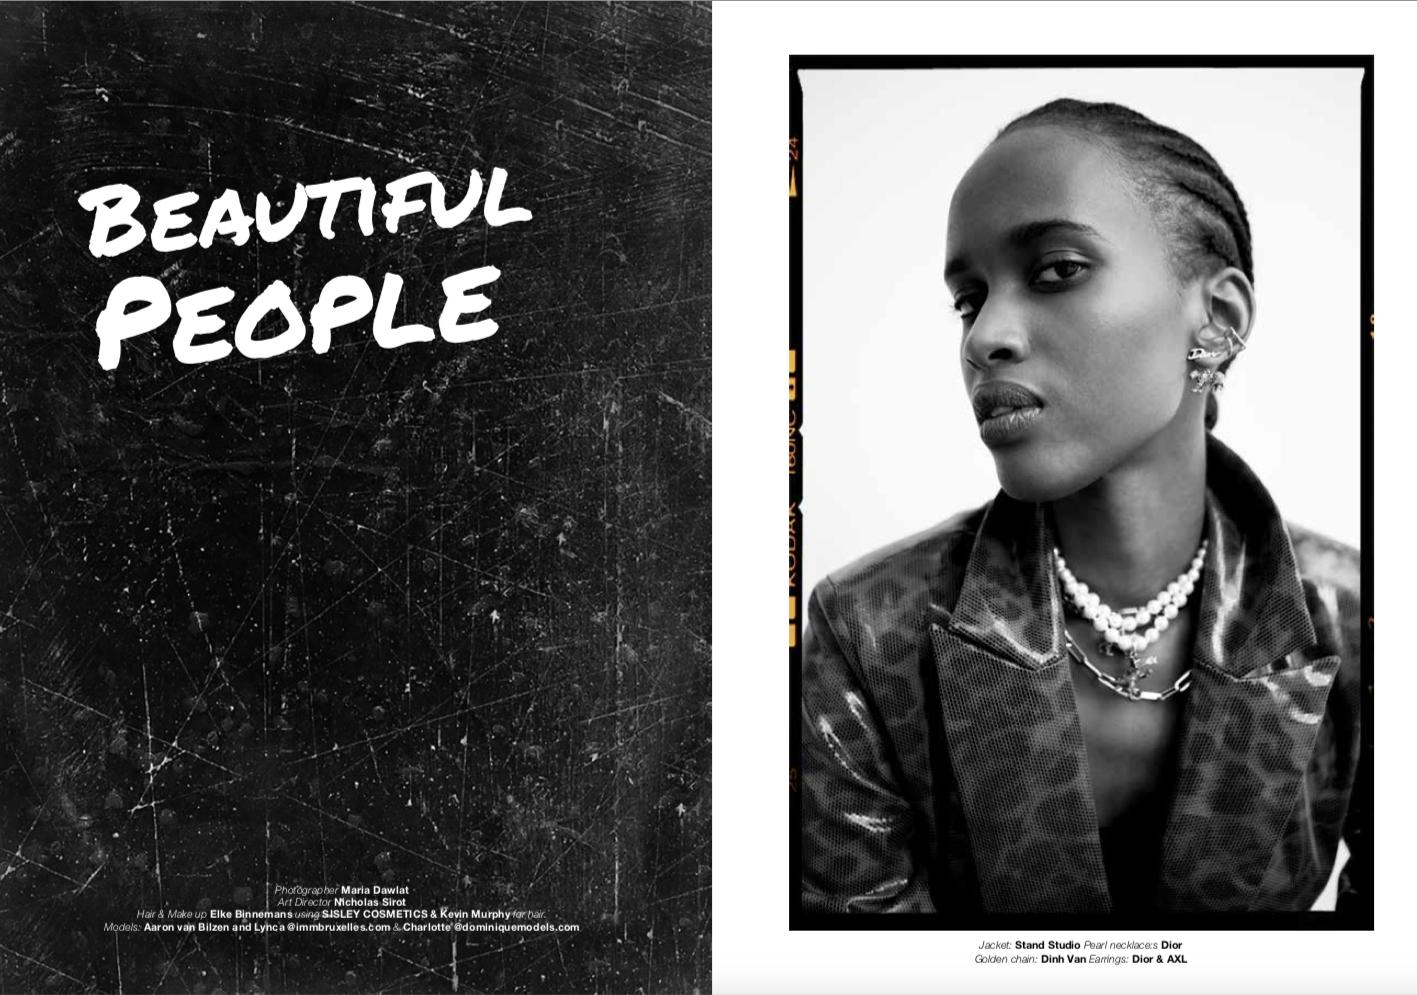 'Together Magazine' ©Maria Dawlat